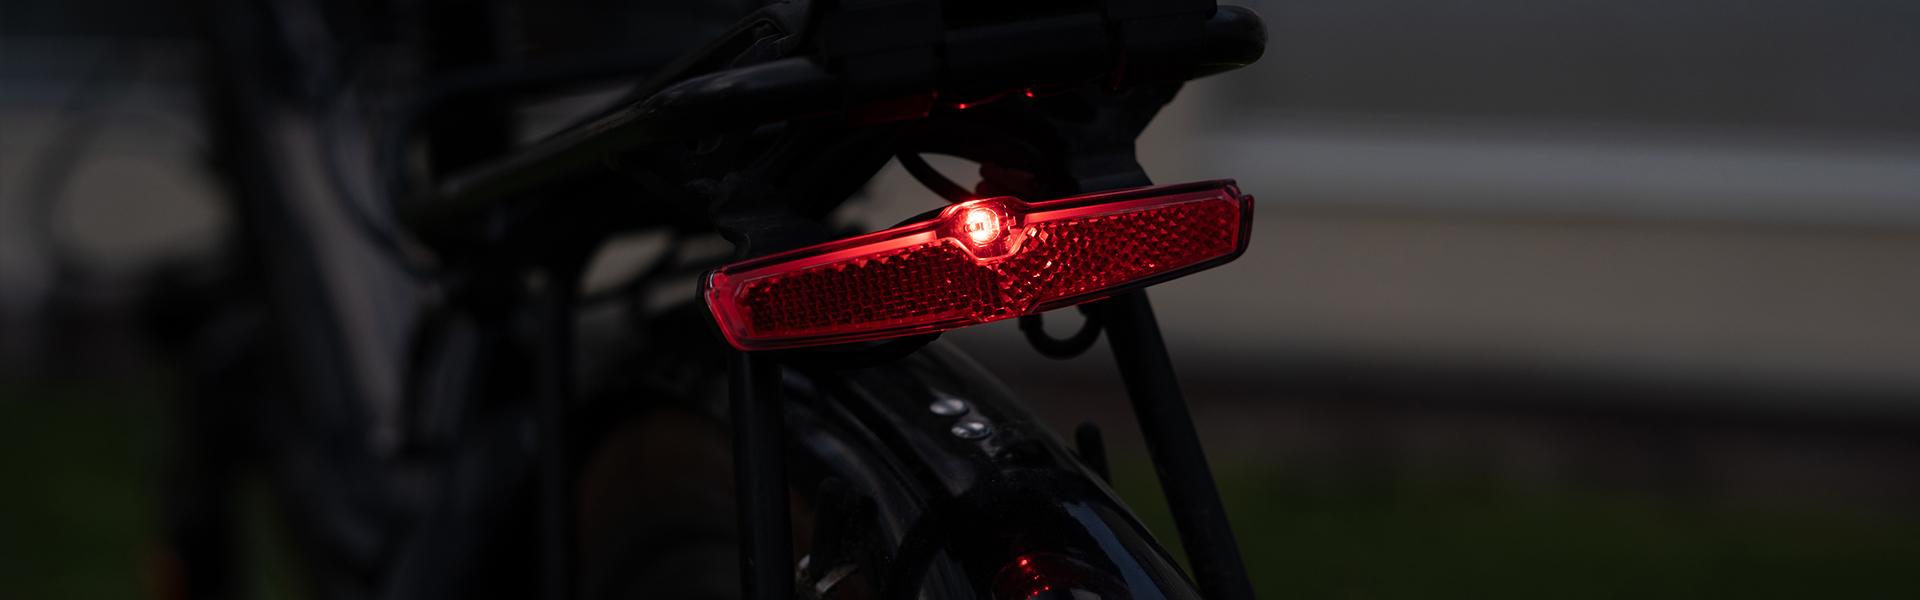 Sate-lite USB rechargeable bike light StVZO eletric bike rear  light CREE LED waterproof